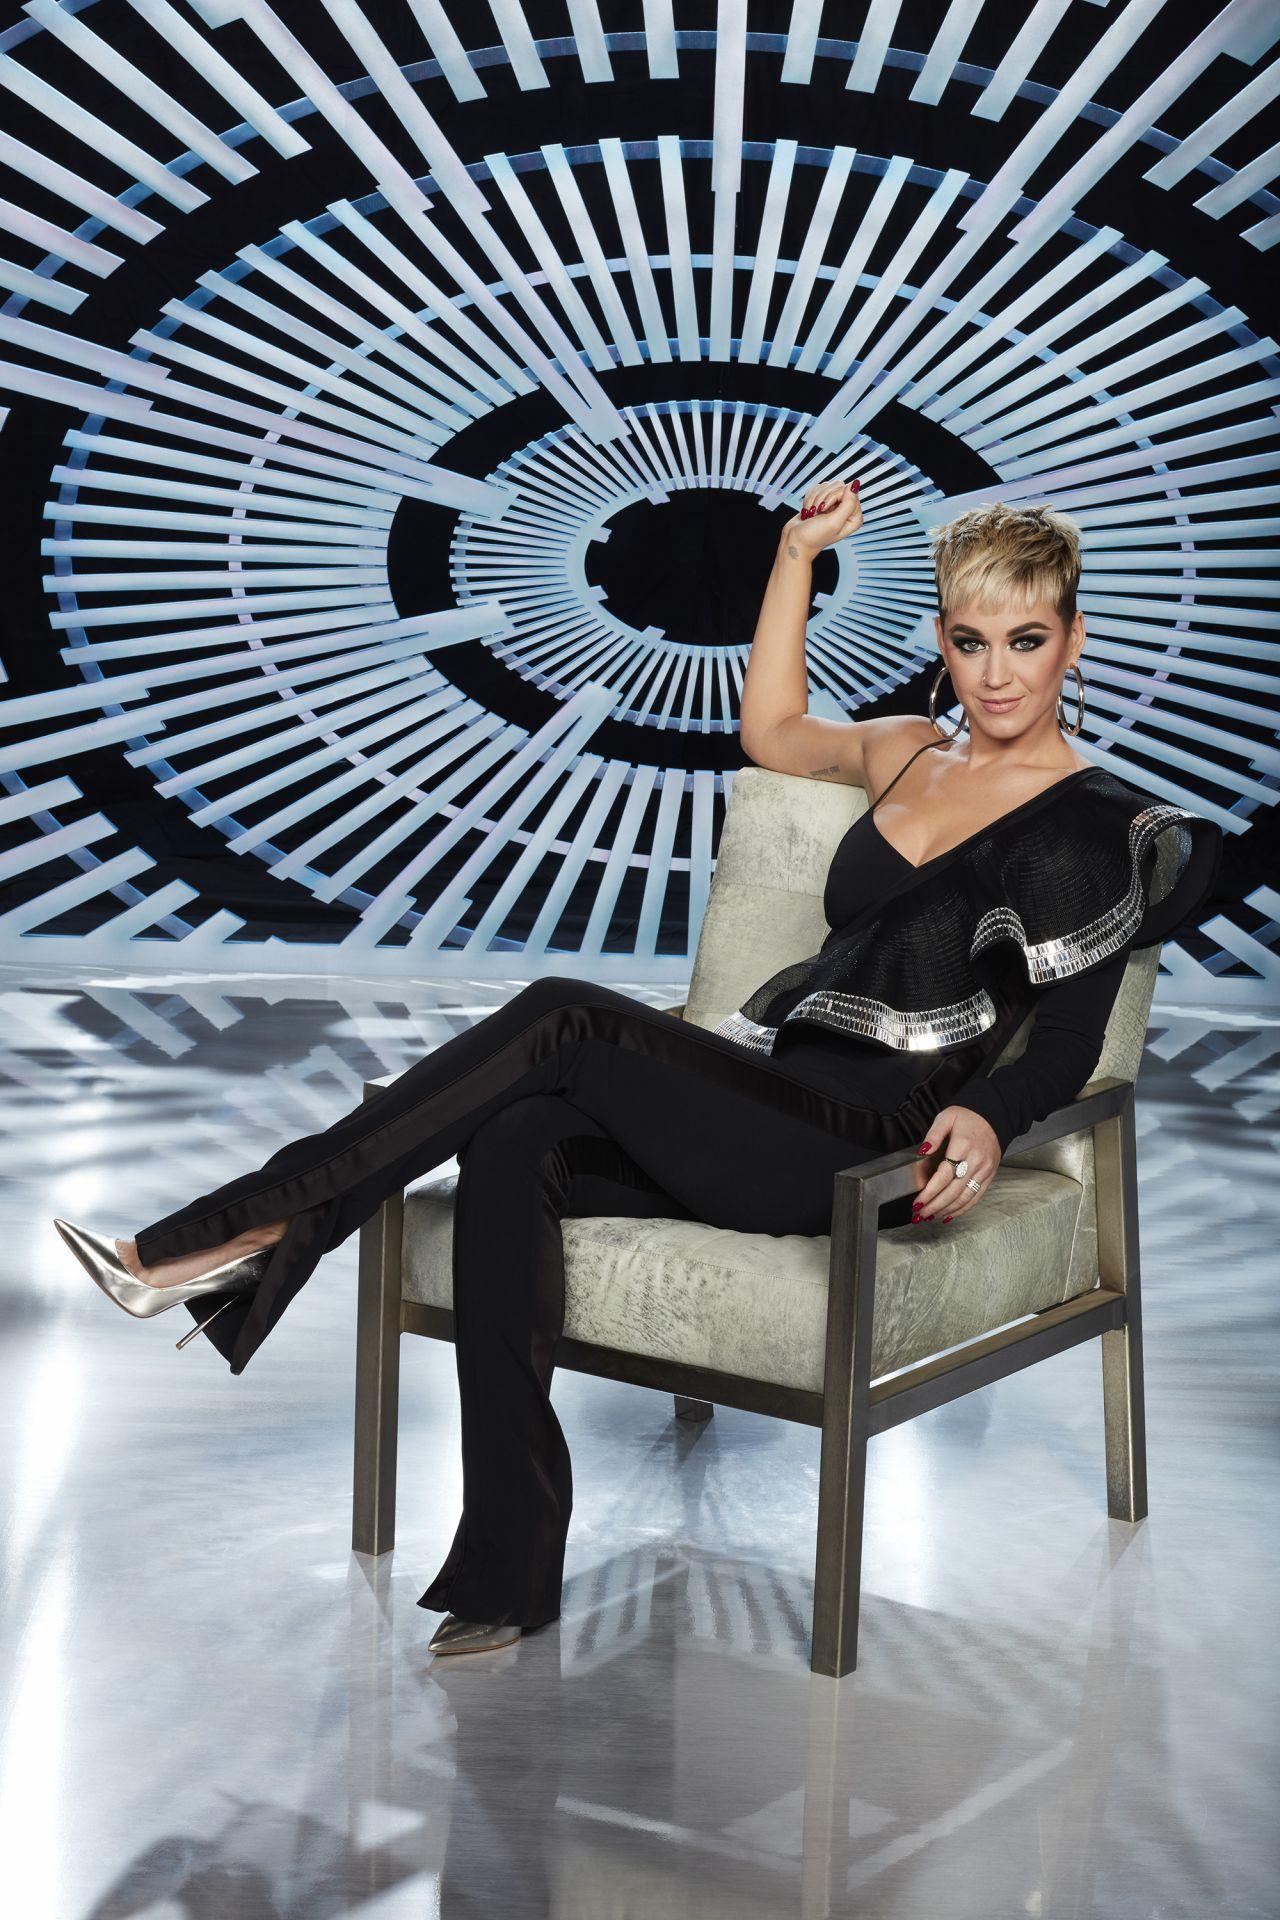 Katy Perry American Idol Portraits